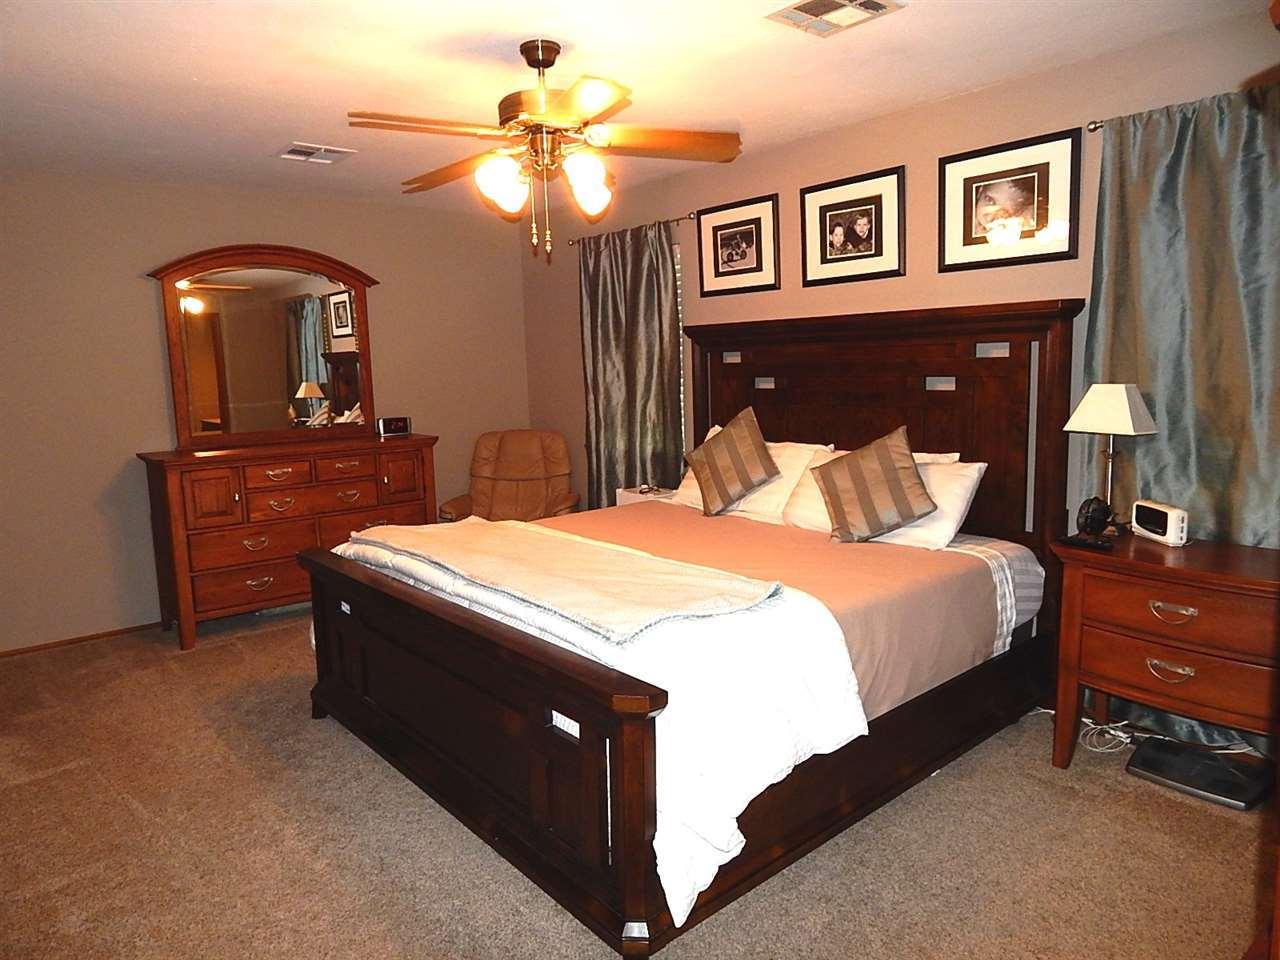 Sold Cross Sale W/ MLS | 2721 Wintergreen Ponca City, OK 74604 18